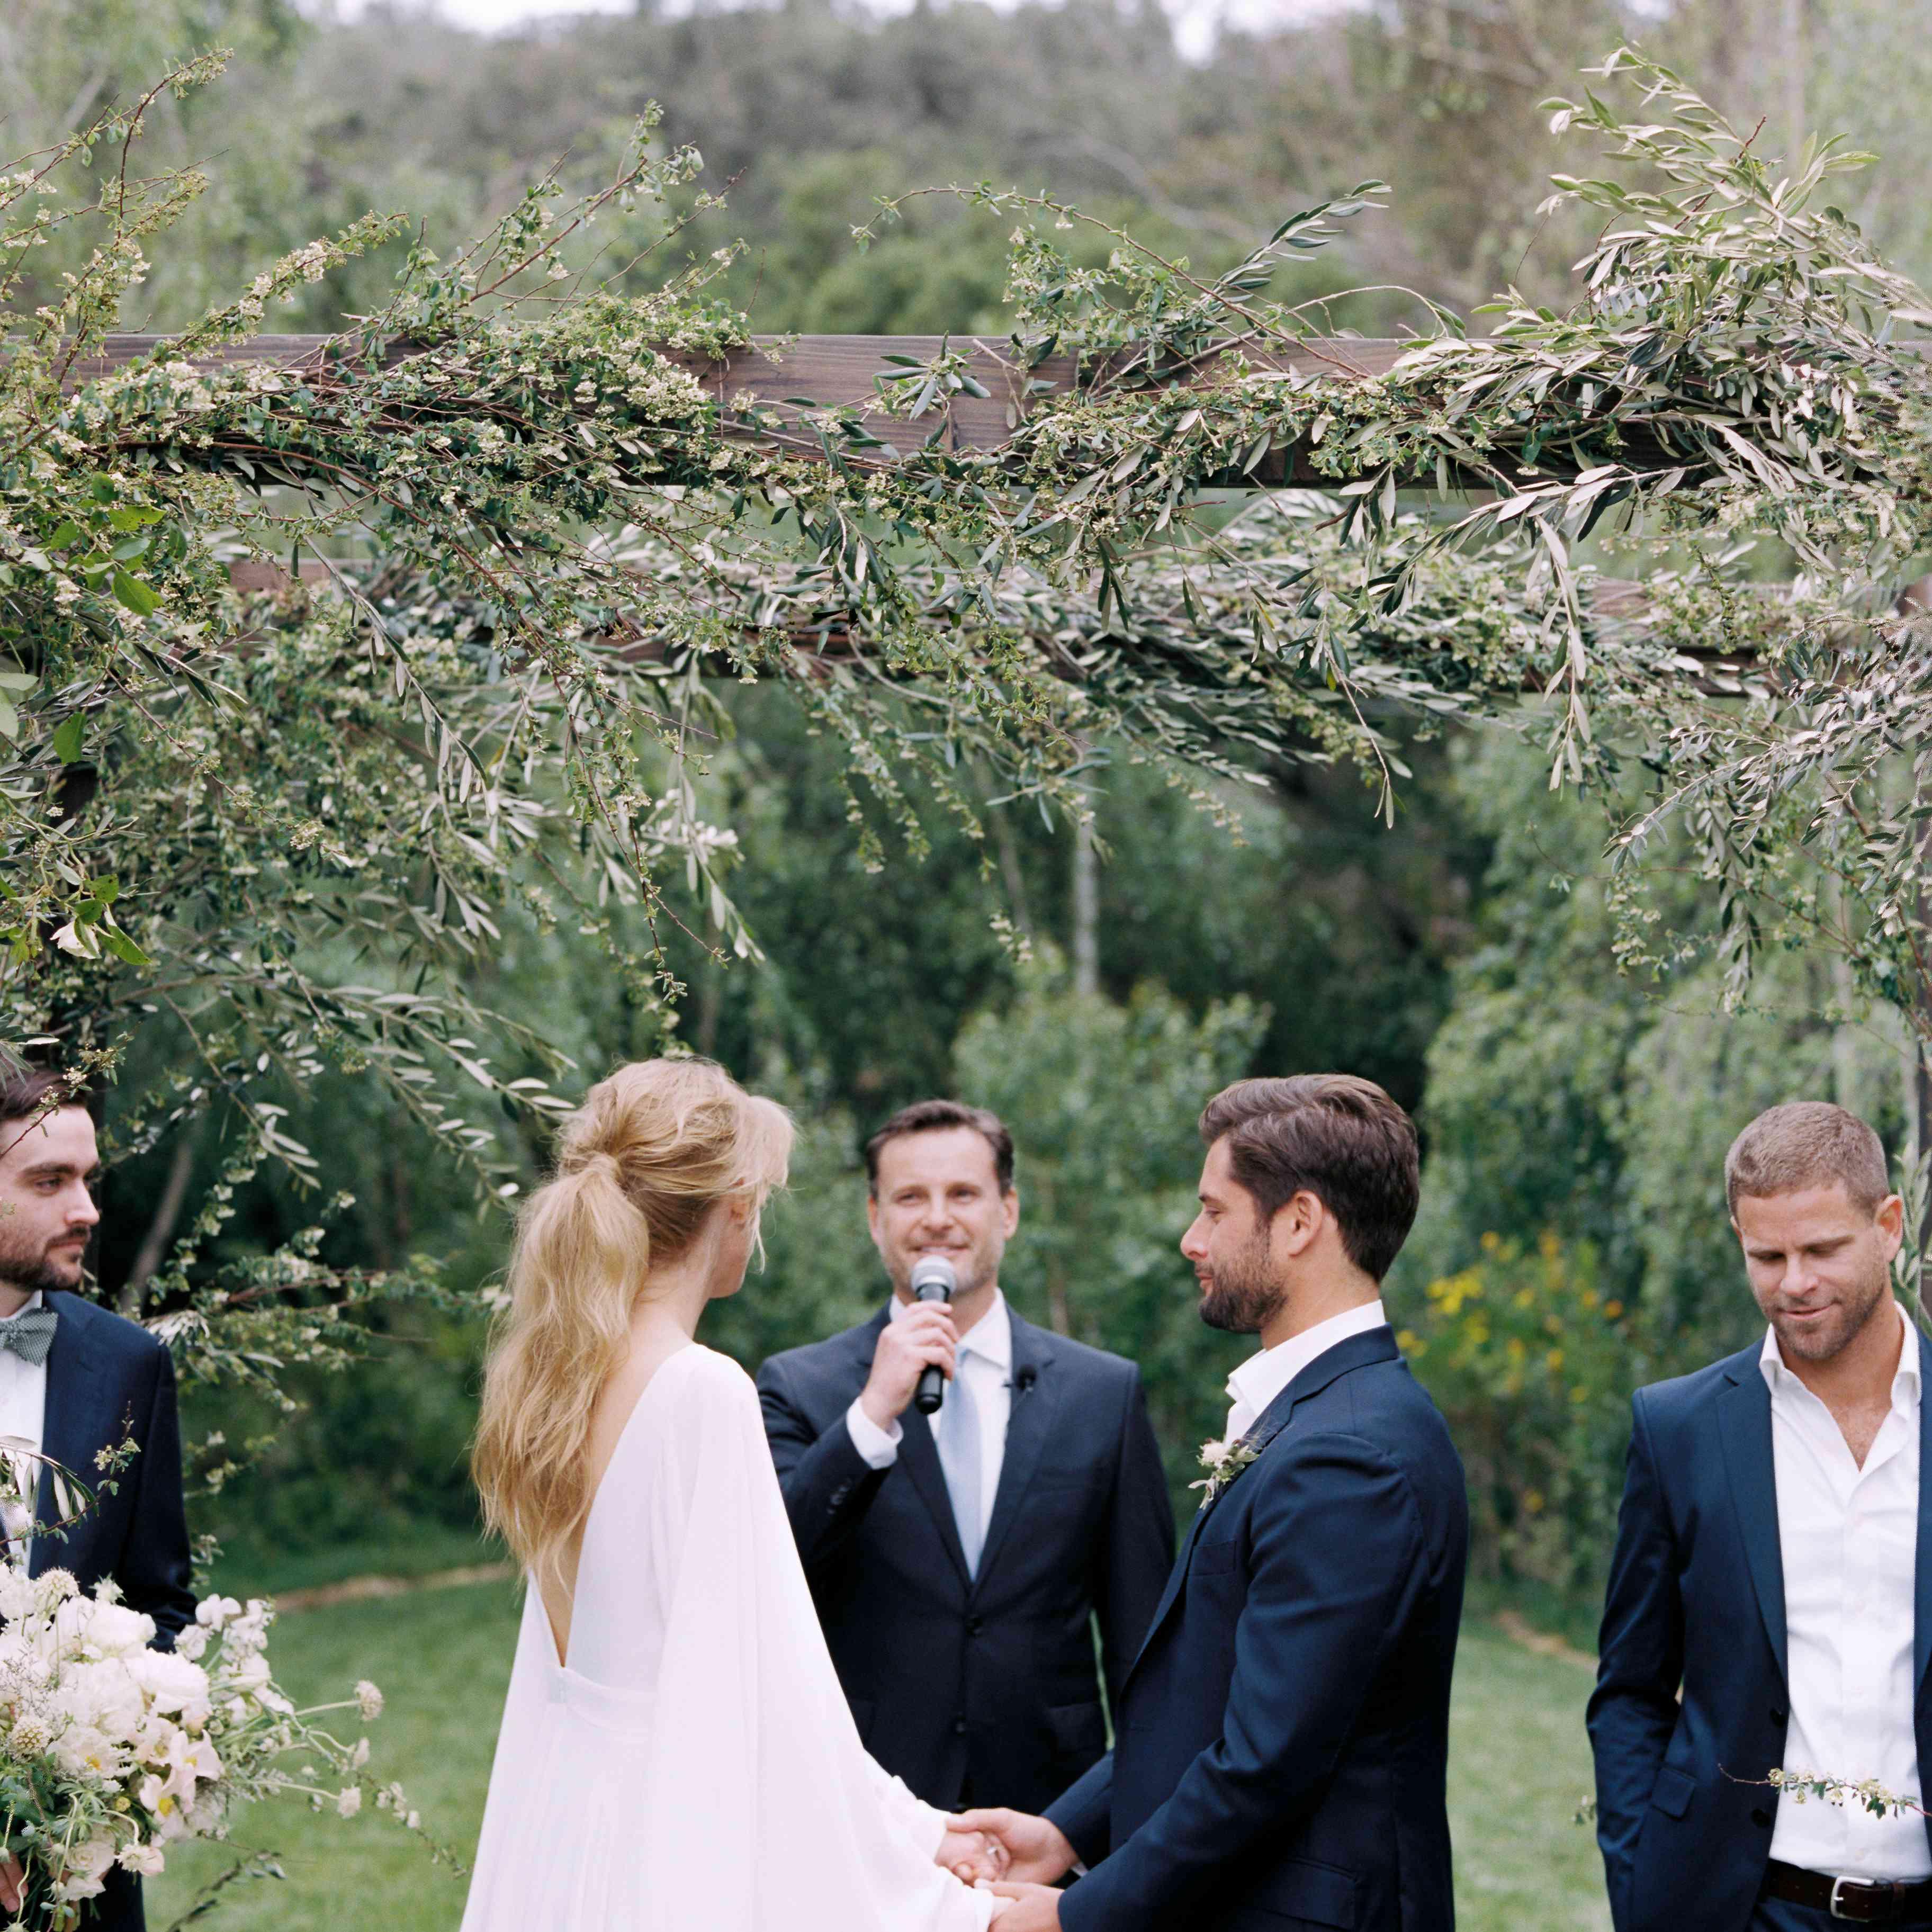 bride and groom holding hands wedding ceremony